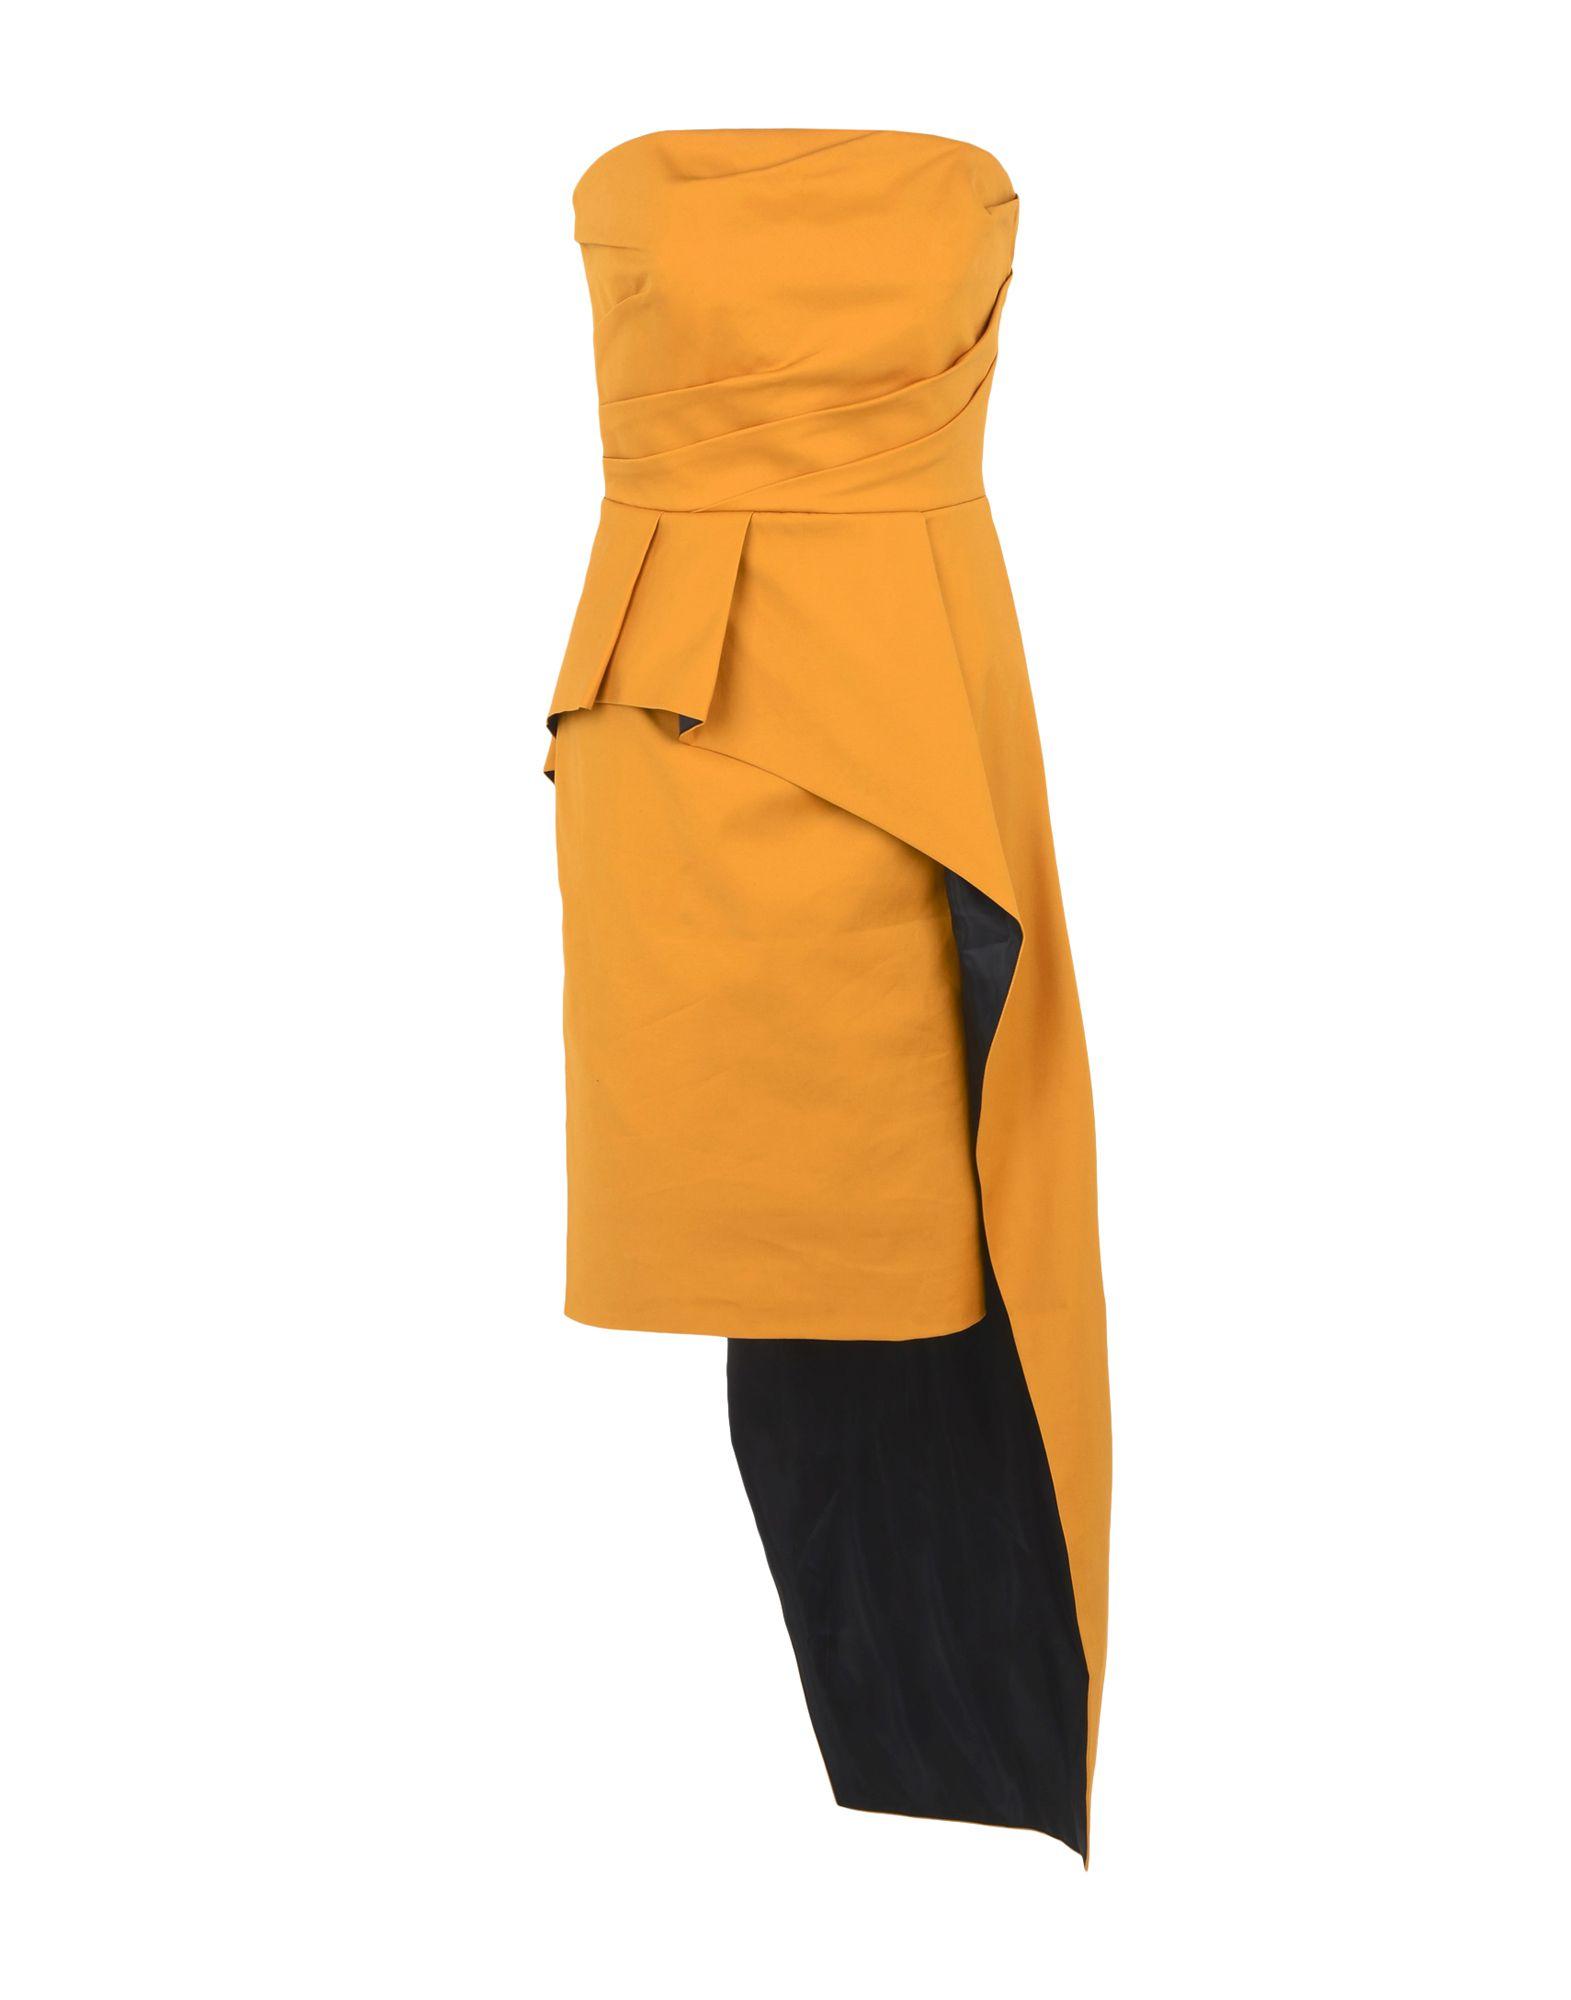 TY-LR Short Dress in Camel